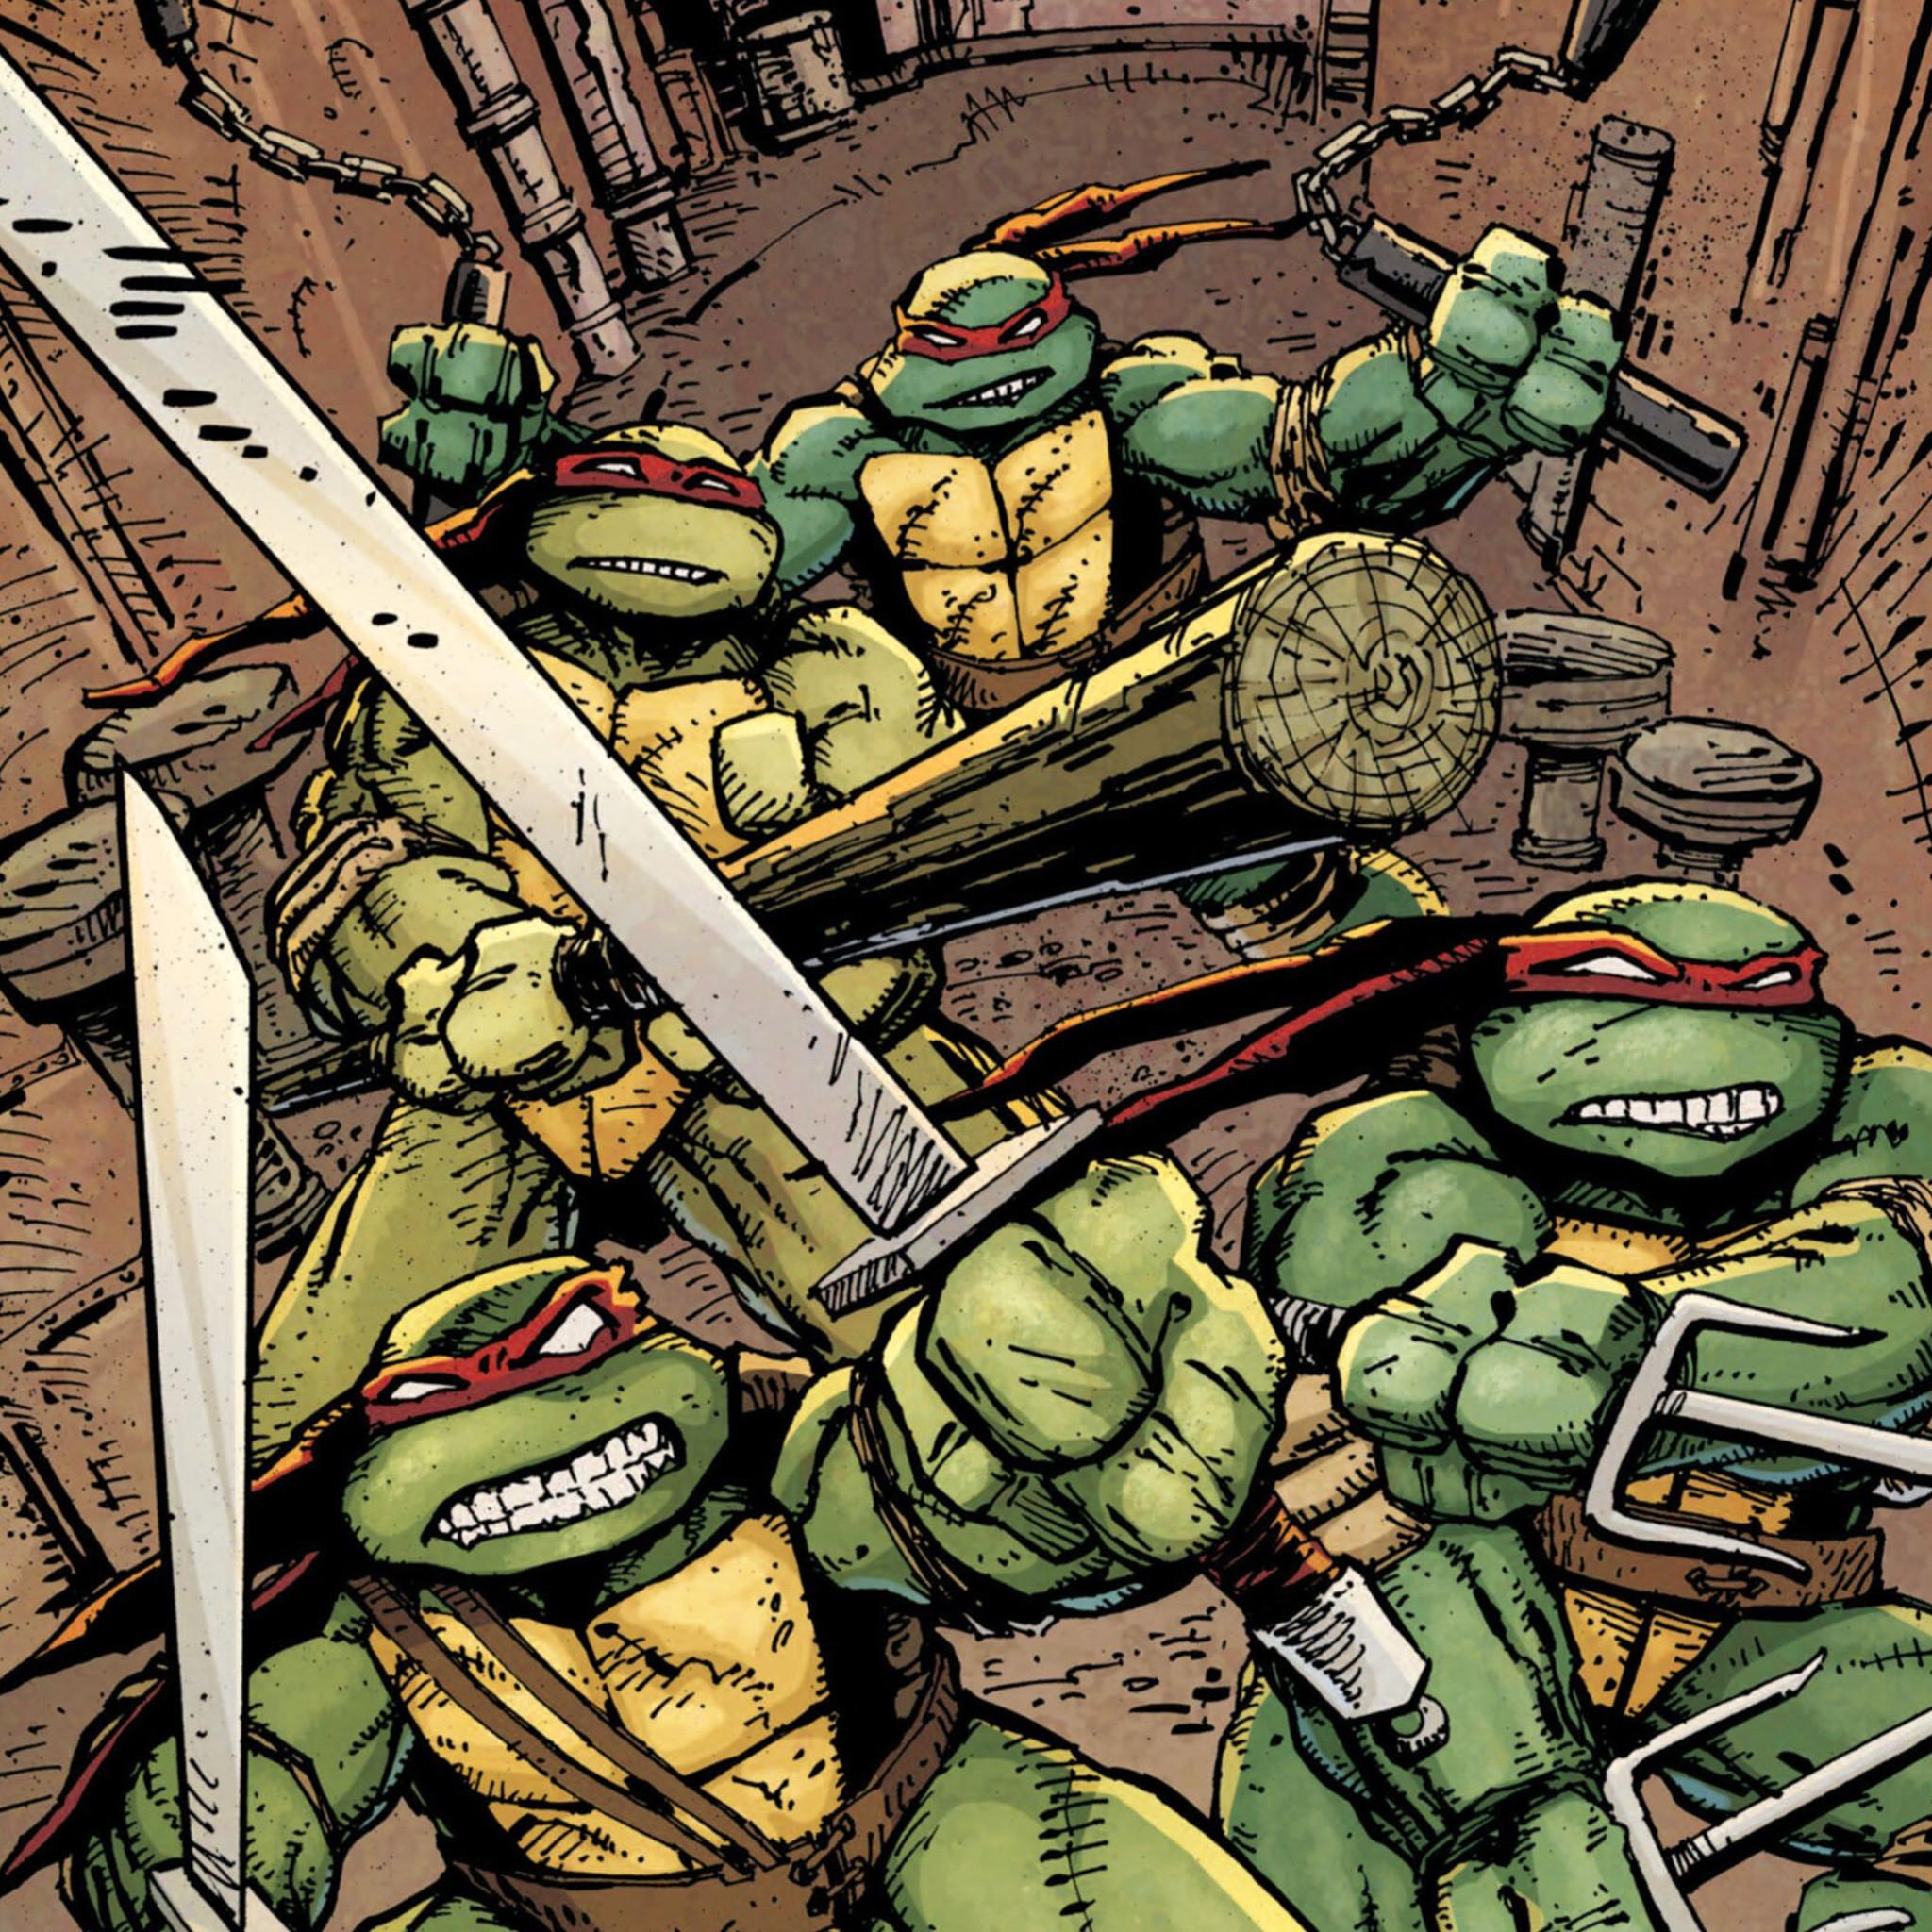 teenage-mutant-ninja-turtles-idw-comic-ipad-wallpaper-laser-time-01 – Laser  Time